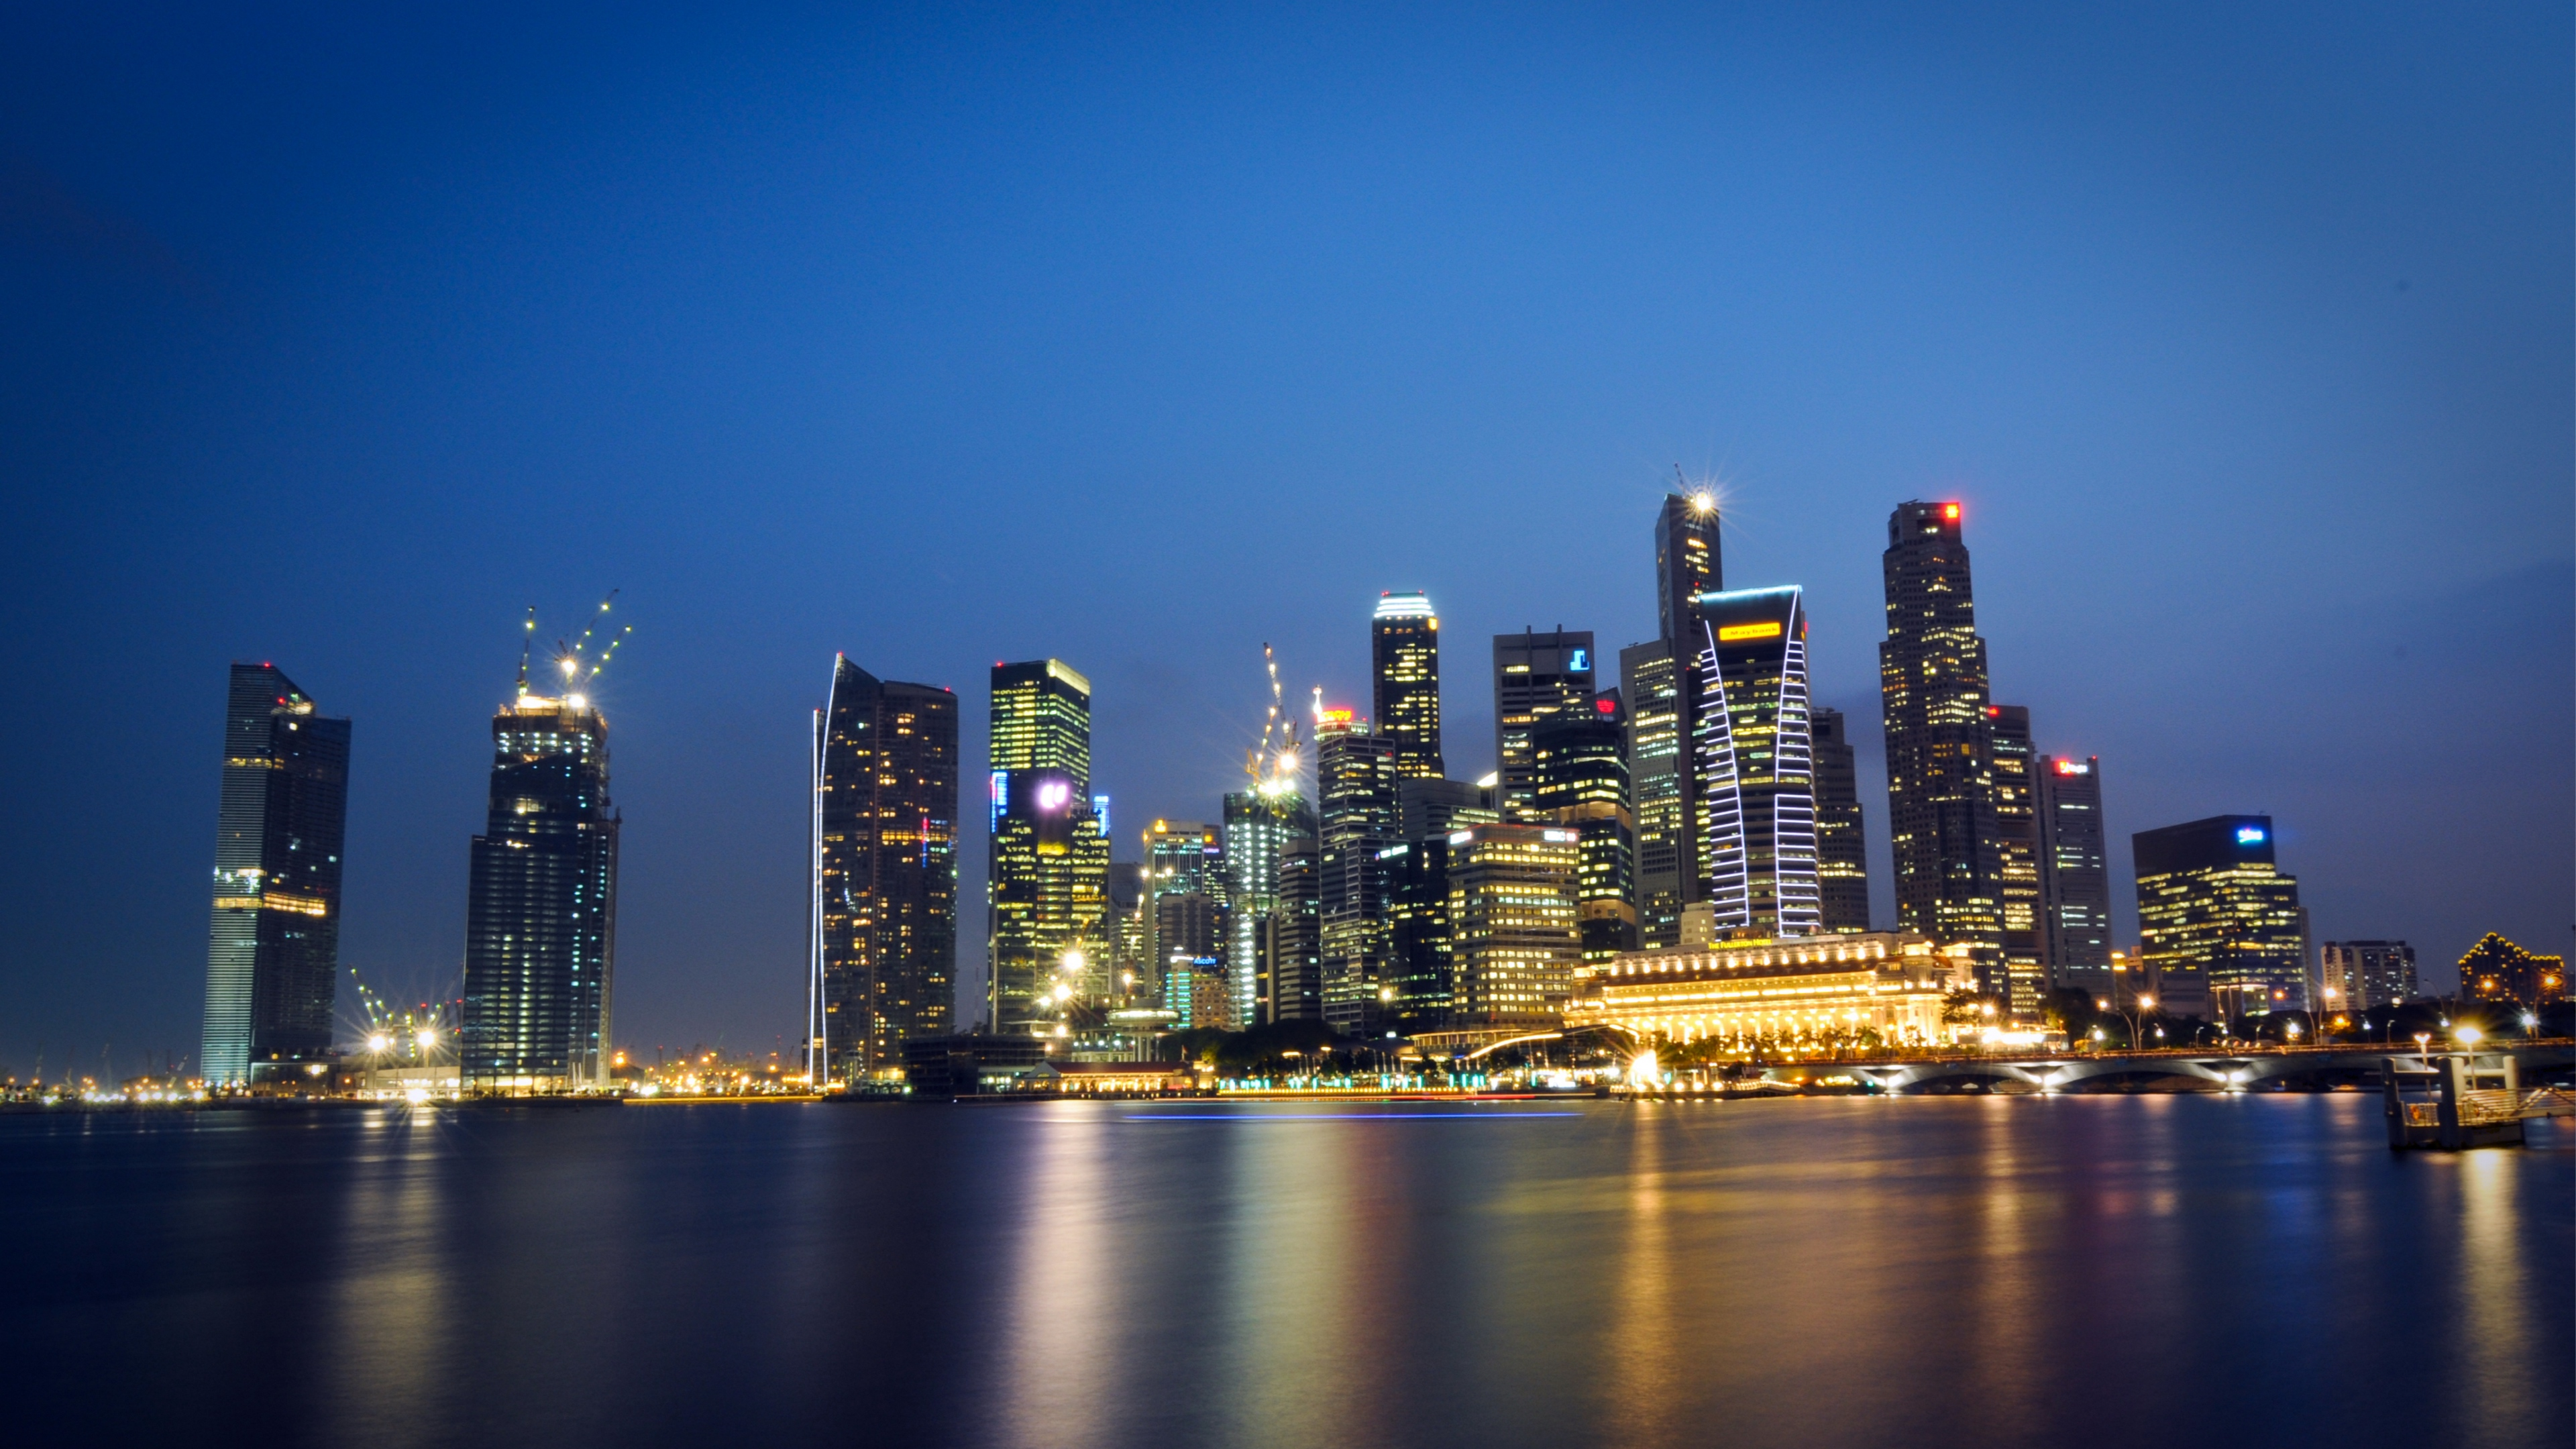 malaysia singapore city state metropolis skyscrapers night lights light blue sky shedding reflection hdr 4k 1538065417 - malaysia, singapore, city-state, metropolis, skyscrapers, night lights, light blue, sky, shedding, reflection, hdr 4k - Singapore, Malaysia, city-state